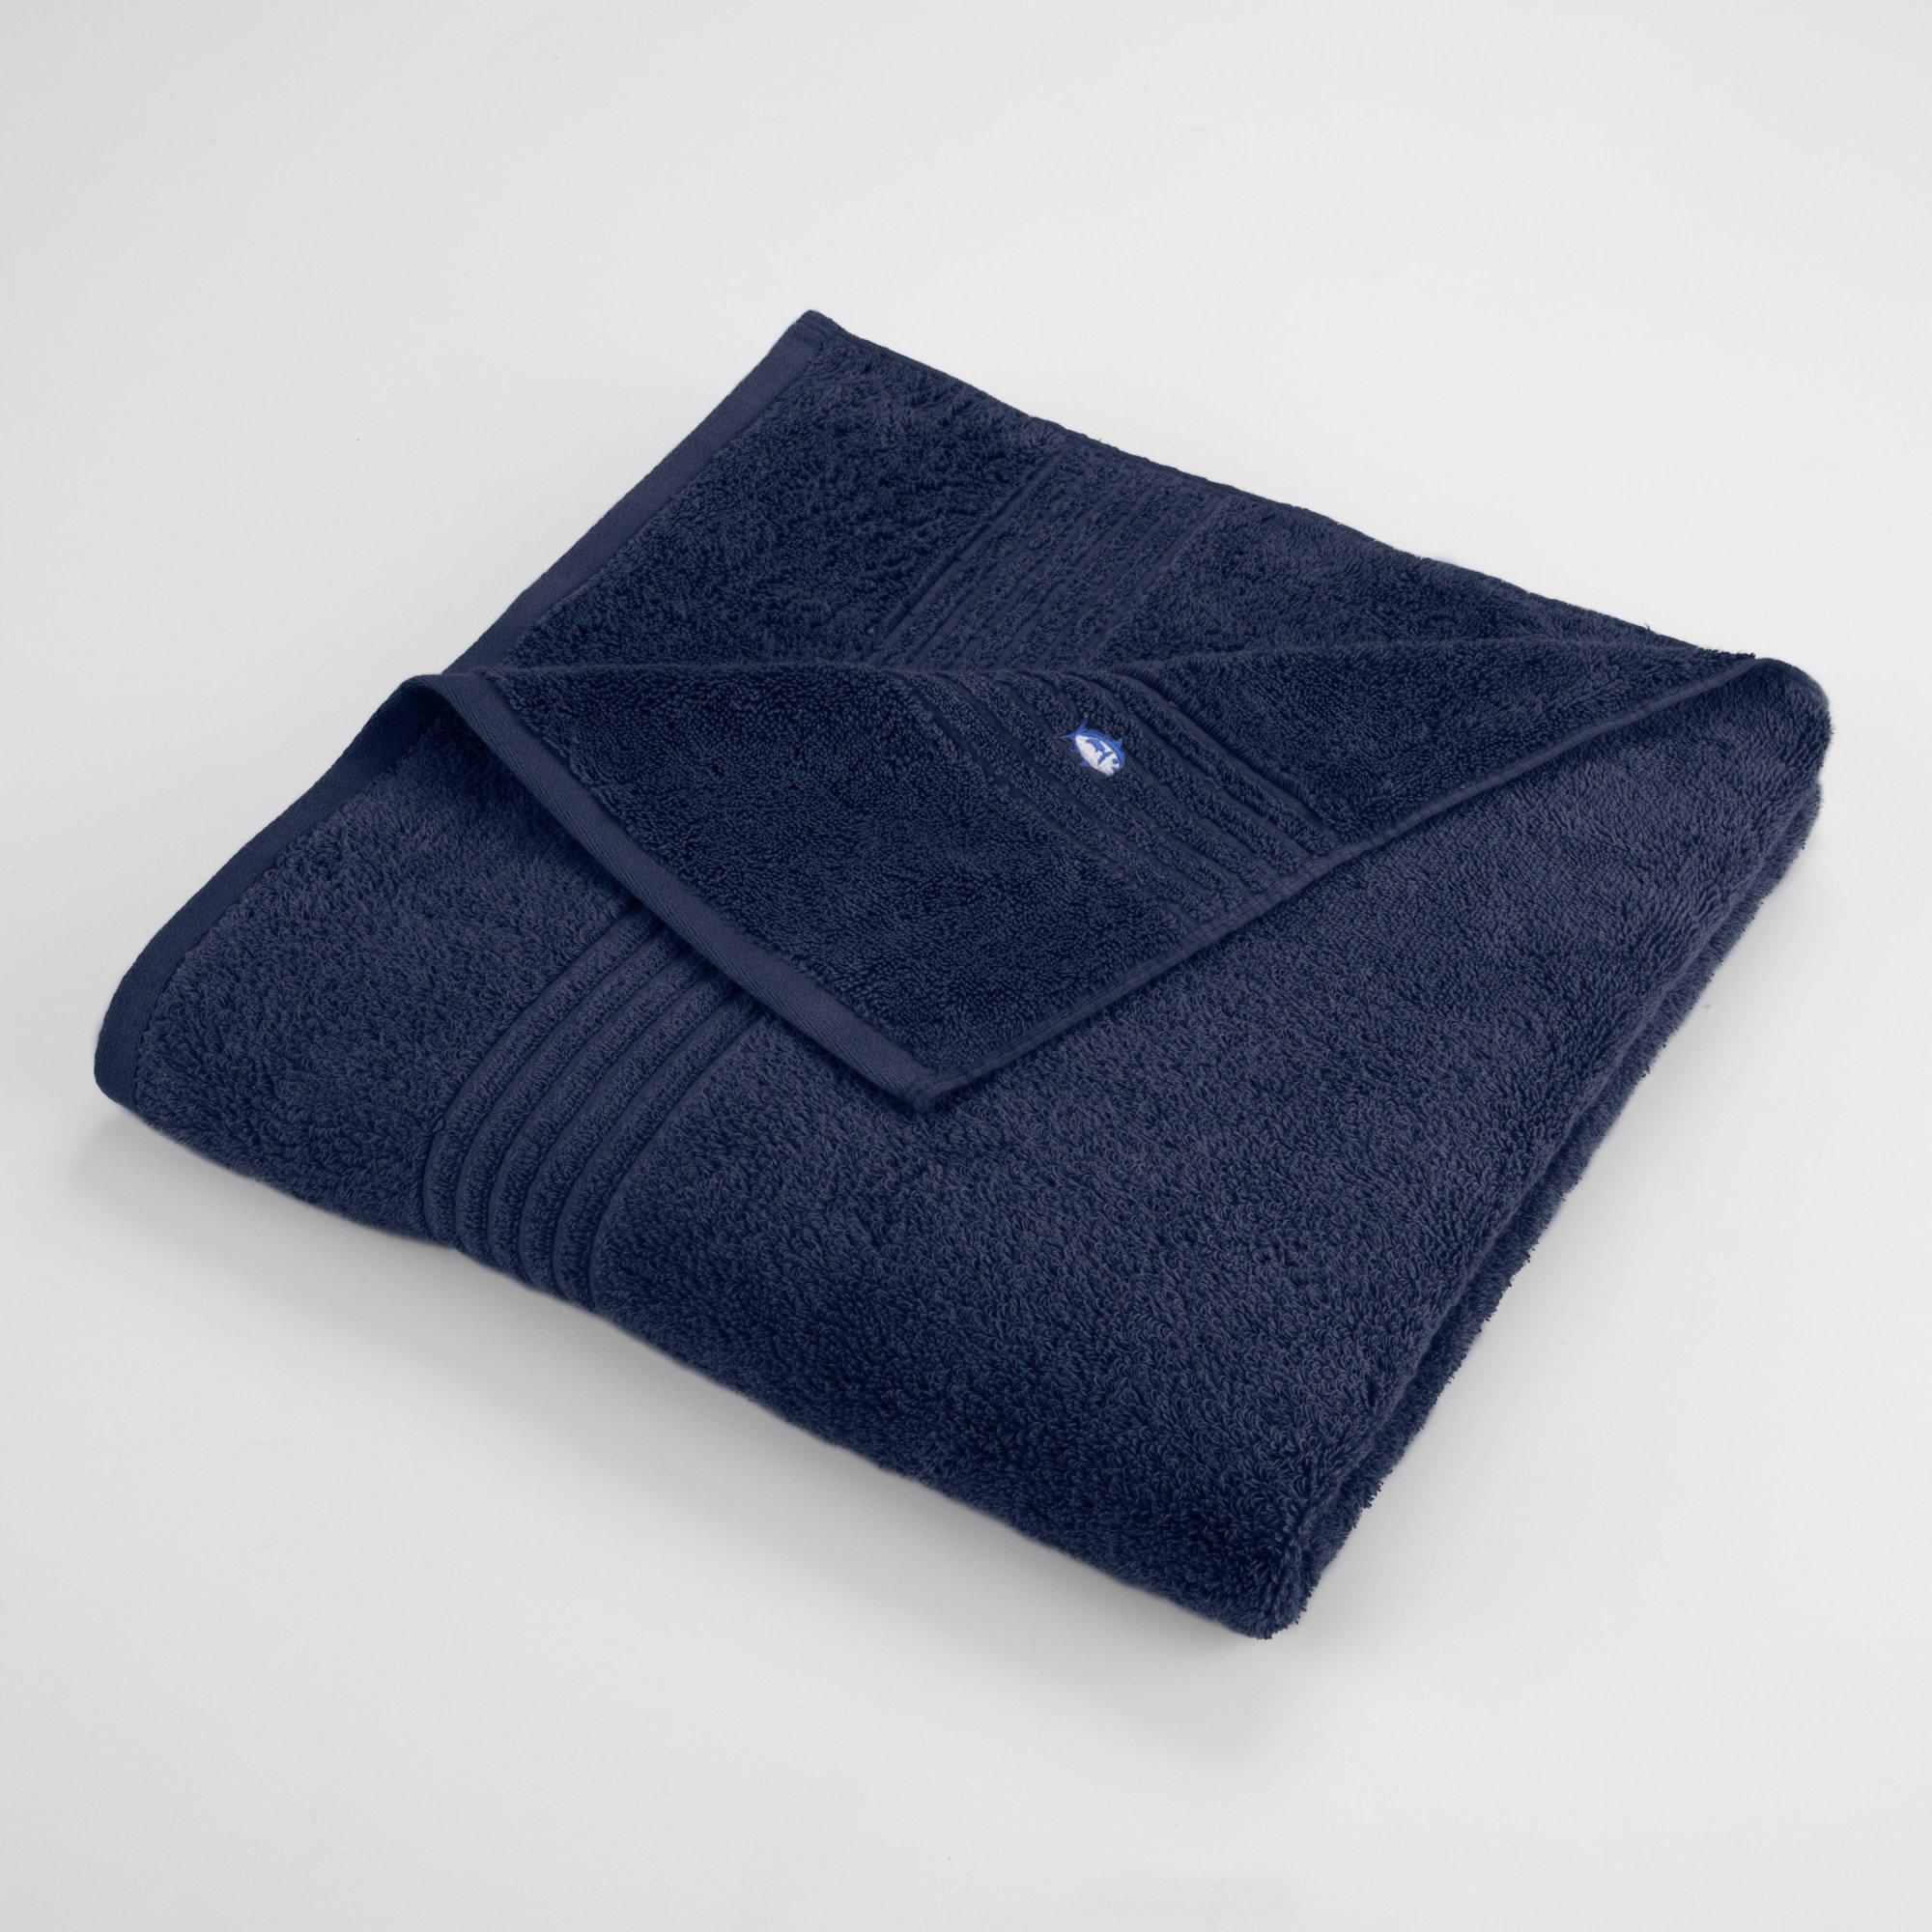 Southern Tide Performance 5.0 Dress Blue/Navy Bath Sheet